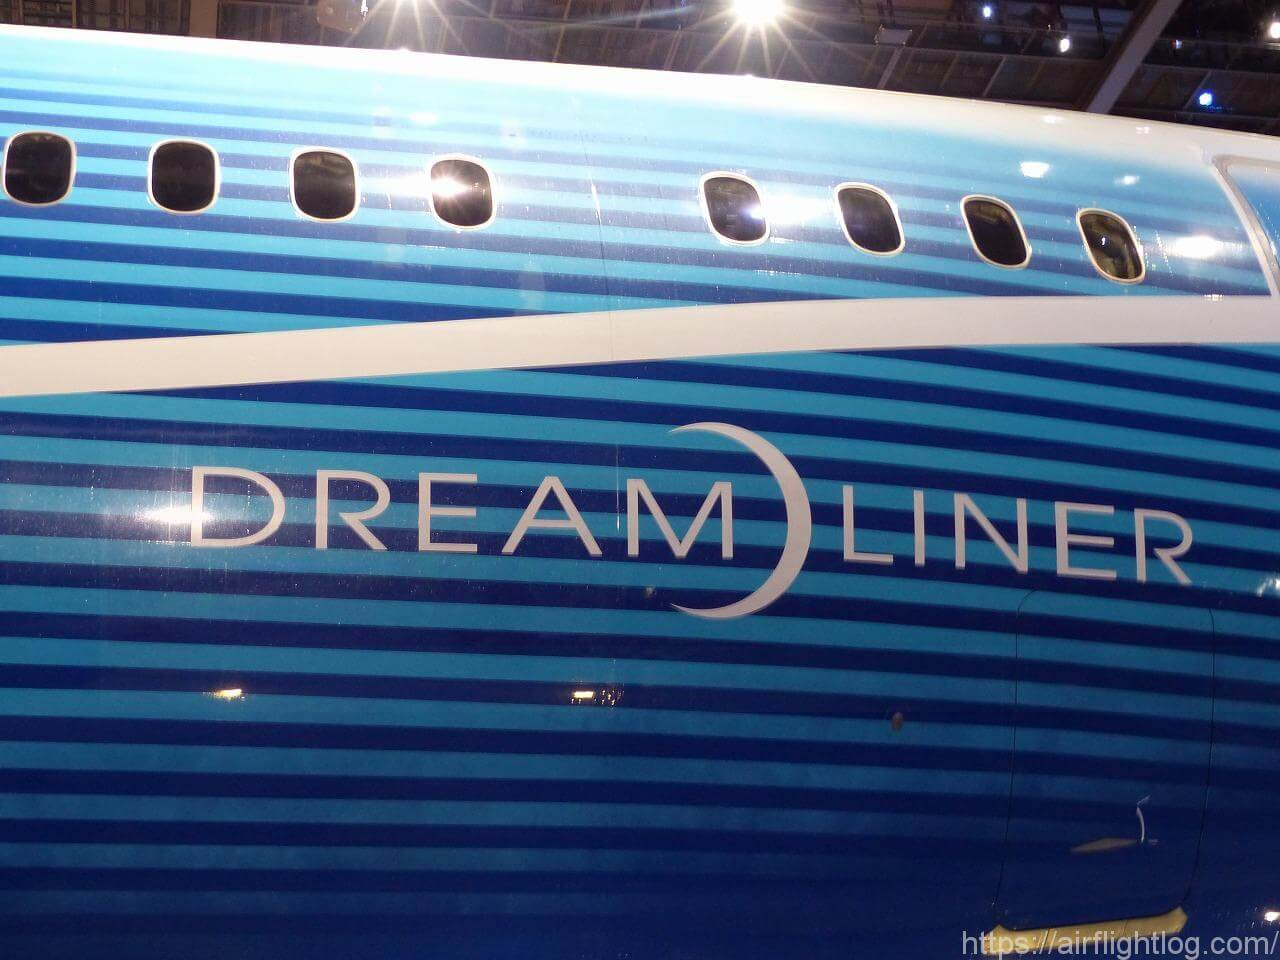 「FLIGHT OF DREAMS(フライト・オブ・ドリームズ)」ボーイング787初号機ドリームライナー